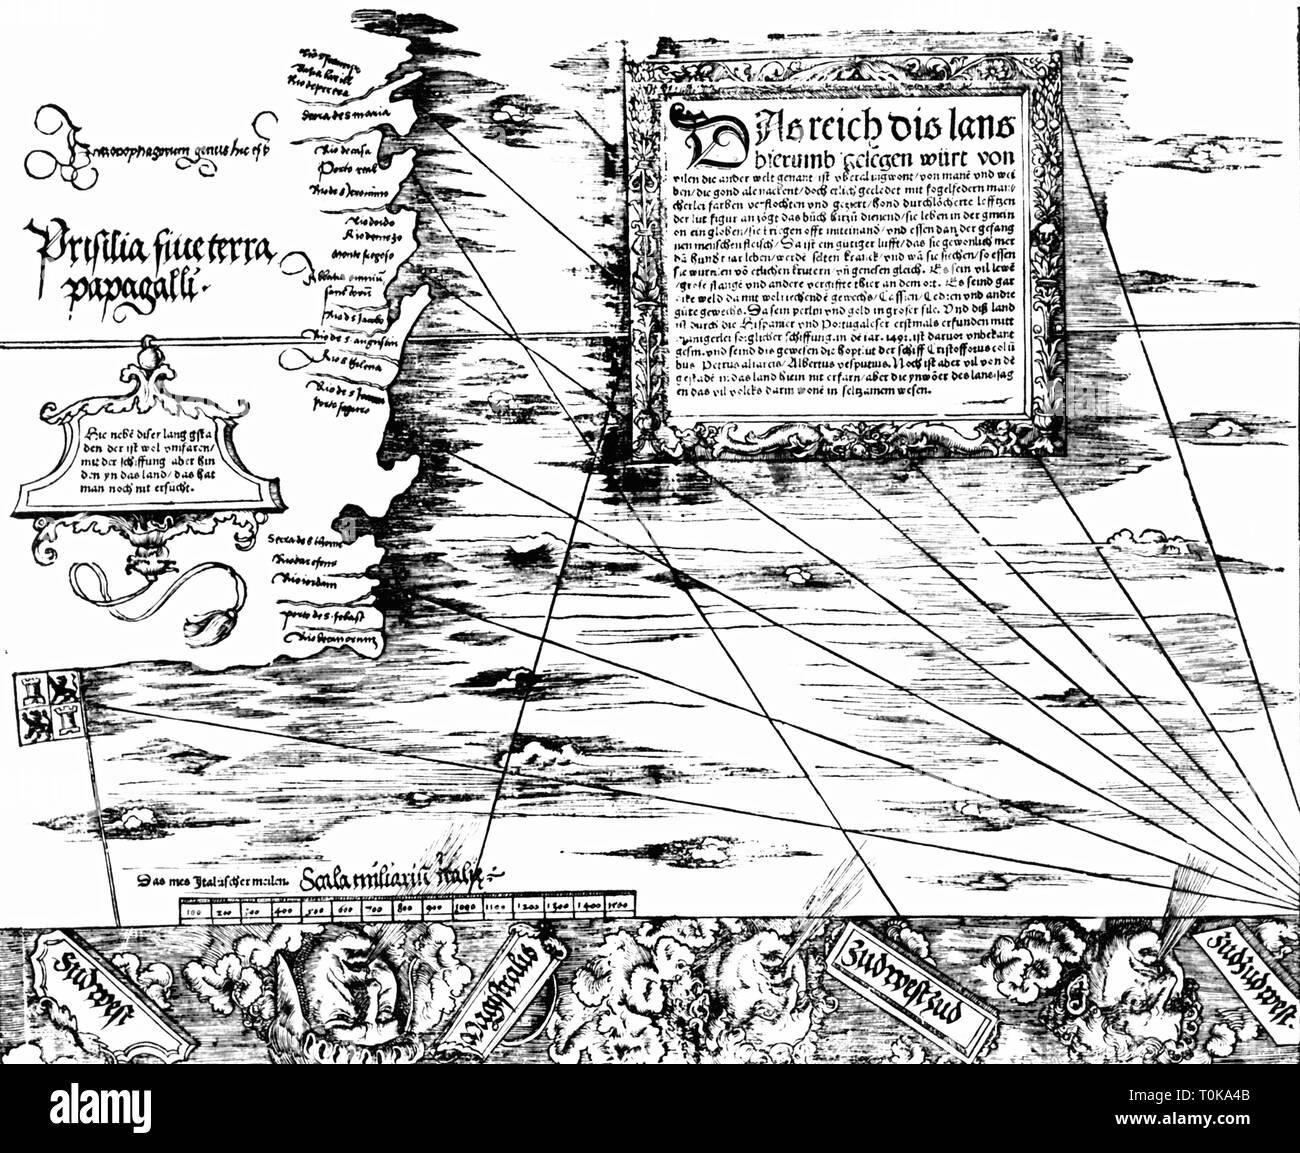 La cartographie, cartes, Brésil, Carta Marina Navigatoria Portugallensis', détail, woodcut, Allemagne, 1525, Additional-Rights Clearance-Info-Not-Available- Photo Stock